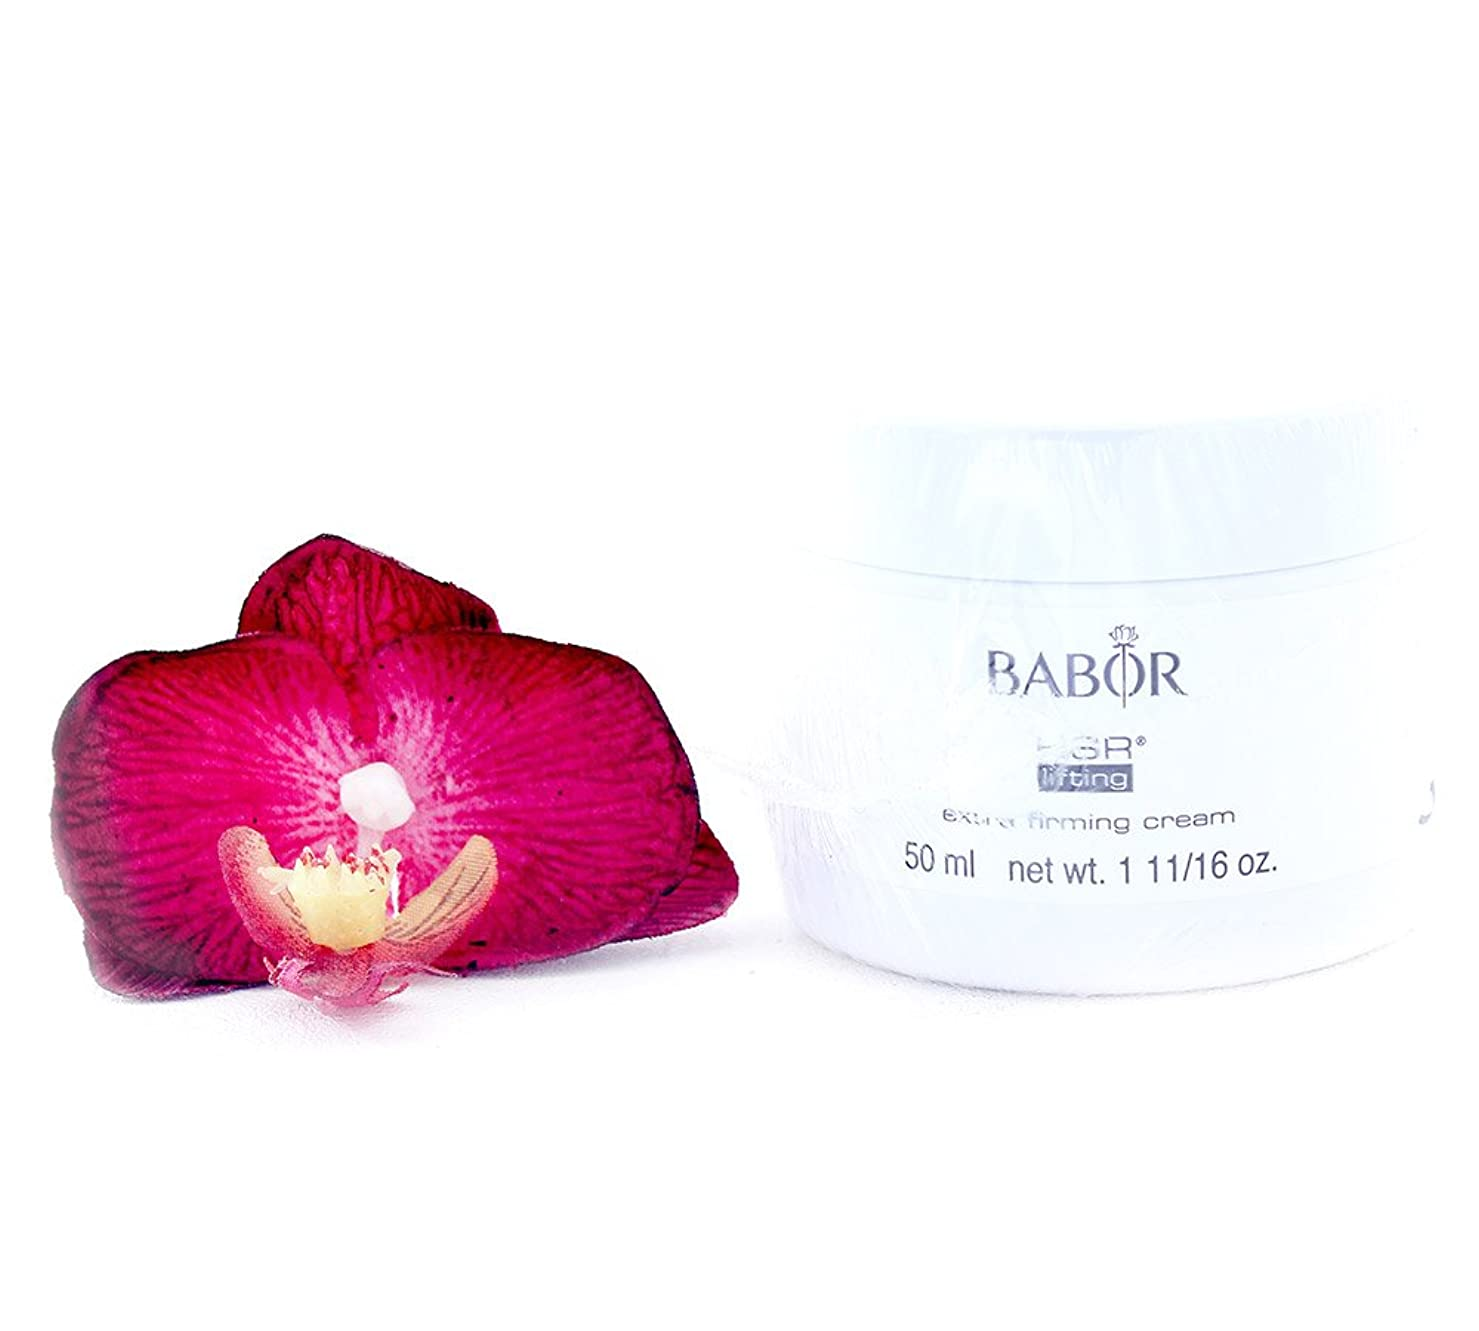 医薬品人質衛星バボール HSR Lifting Extra Firming Cream (Salon Product) 50ml/1.7oz並行輸入品